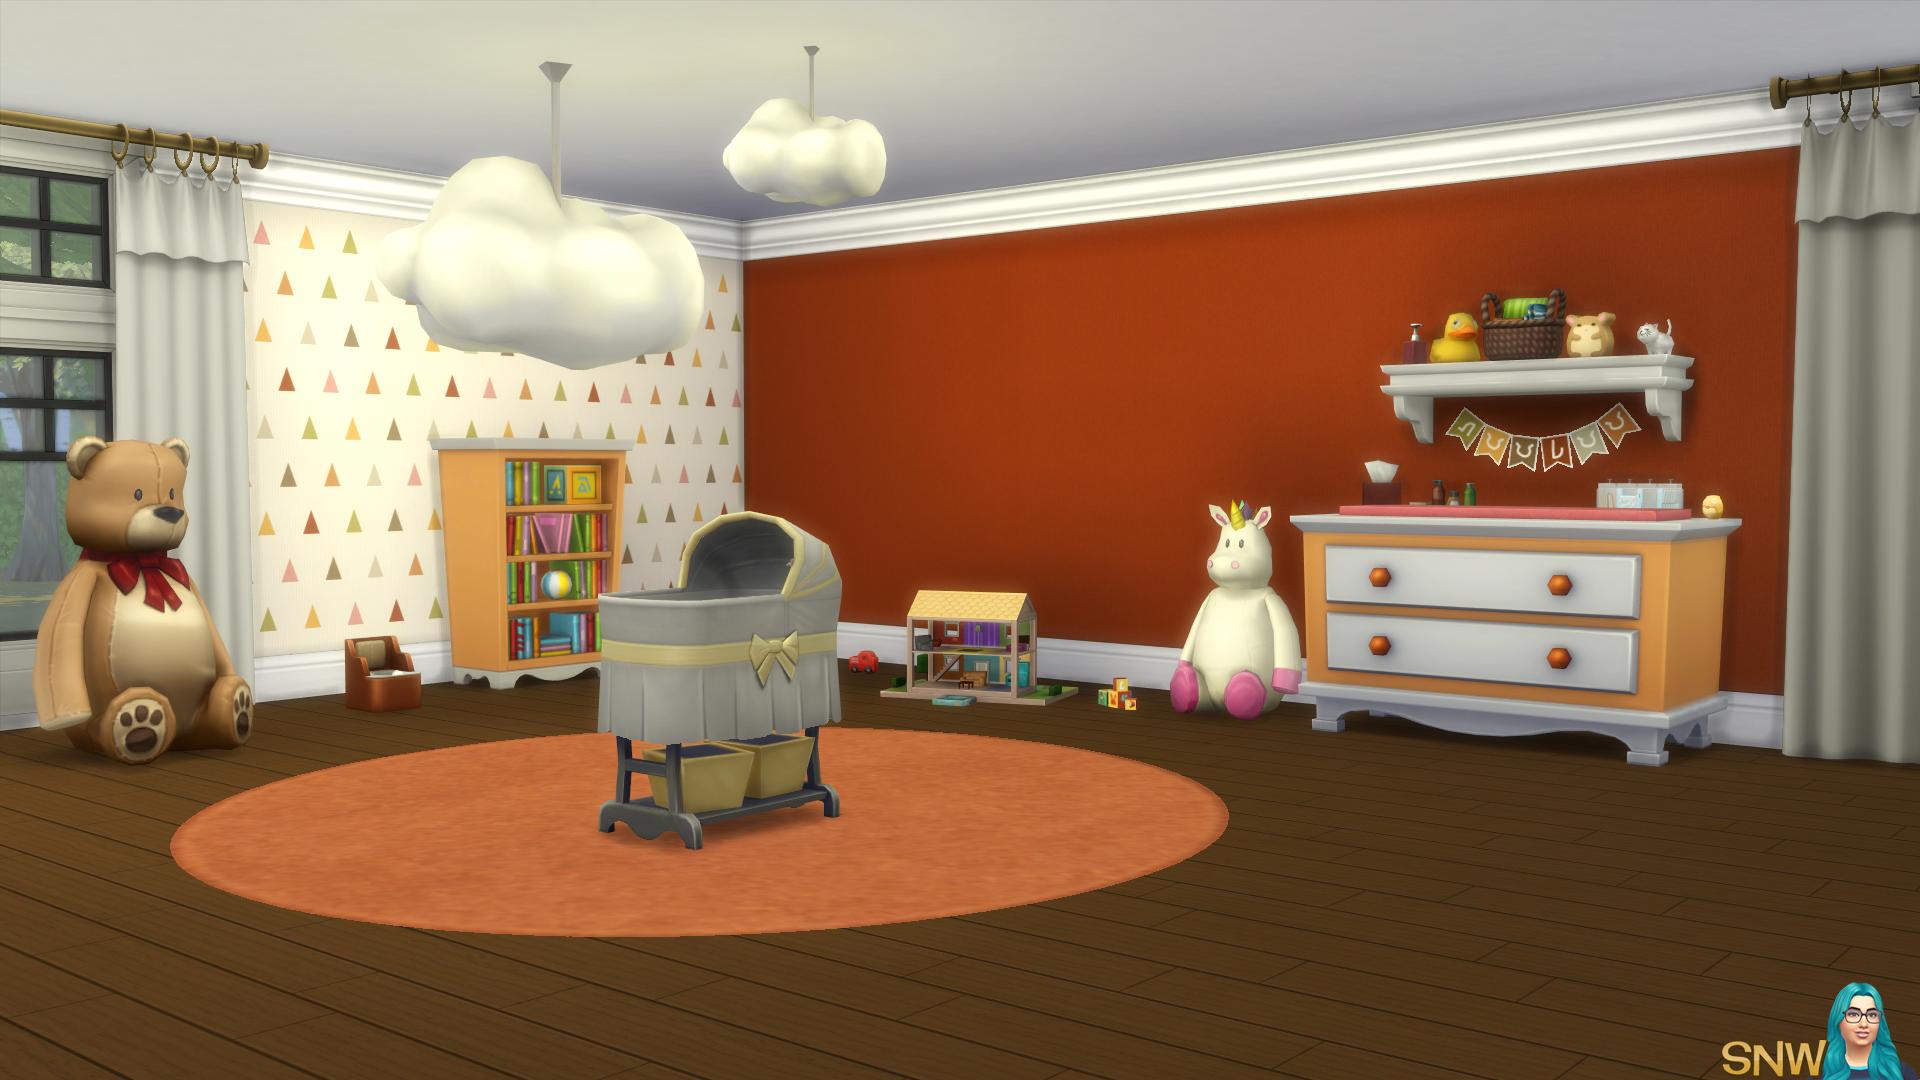 Nursery Walls Set #4 - Basics + Triangles